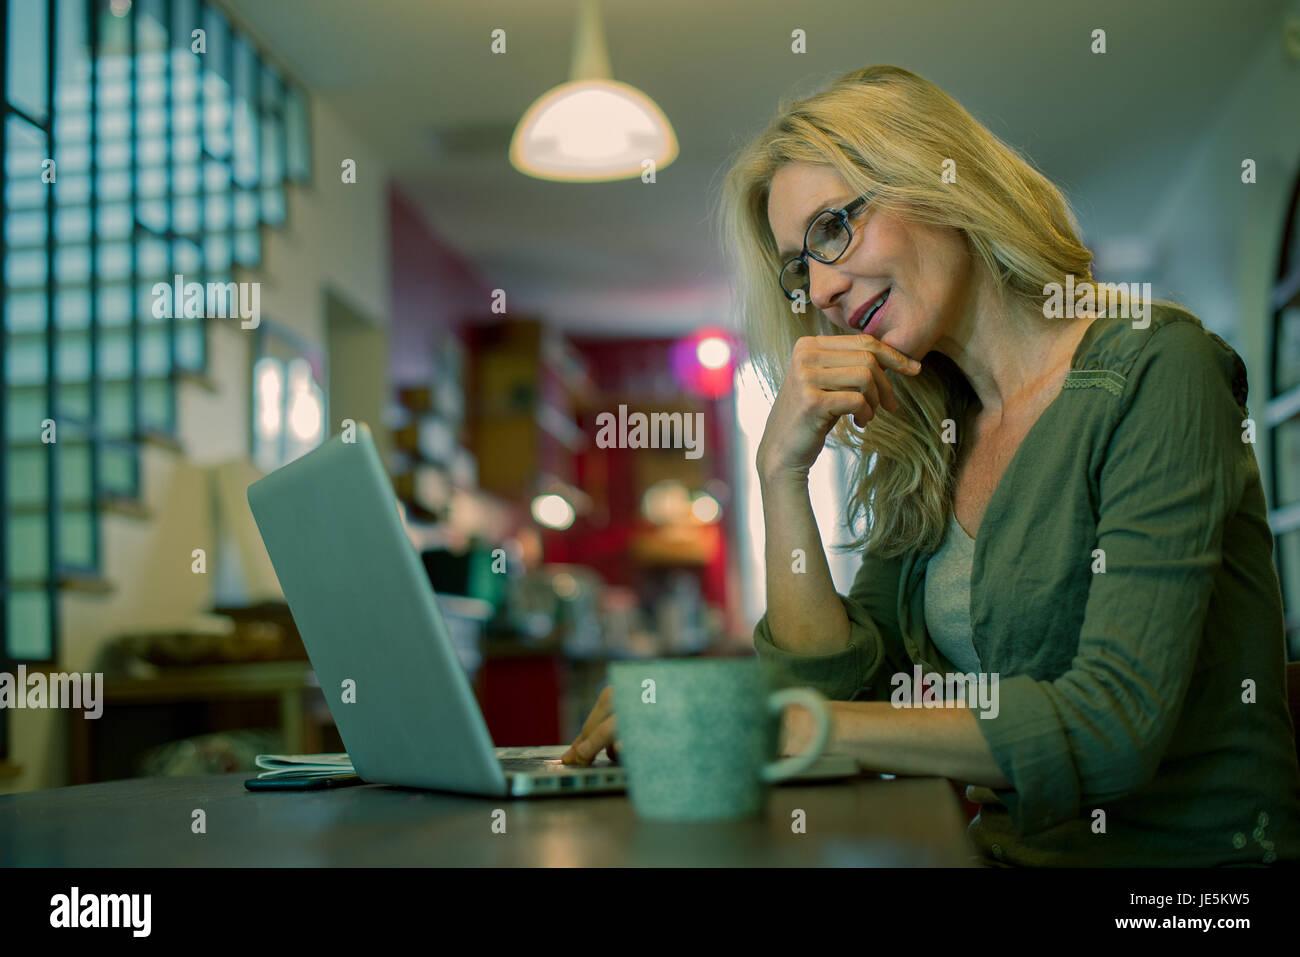 Frau mit Laptop-Computer zu Hause Stockfoto